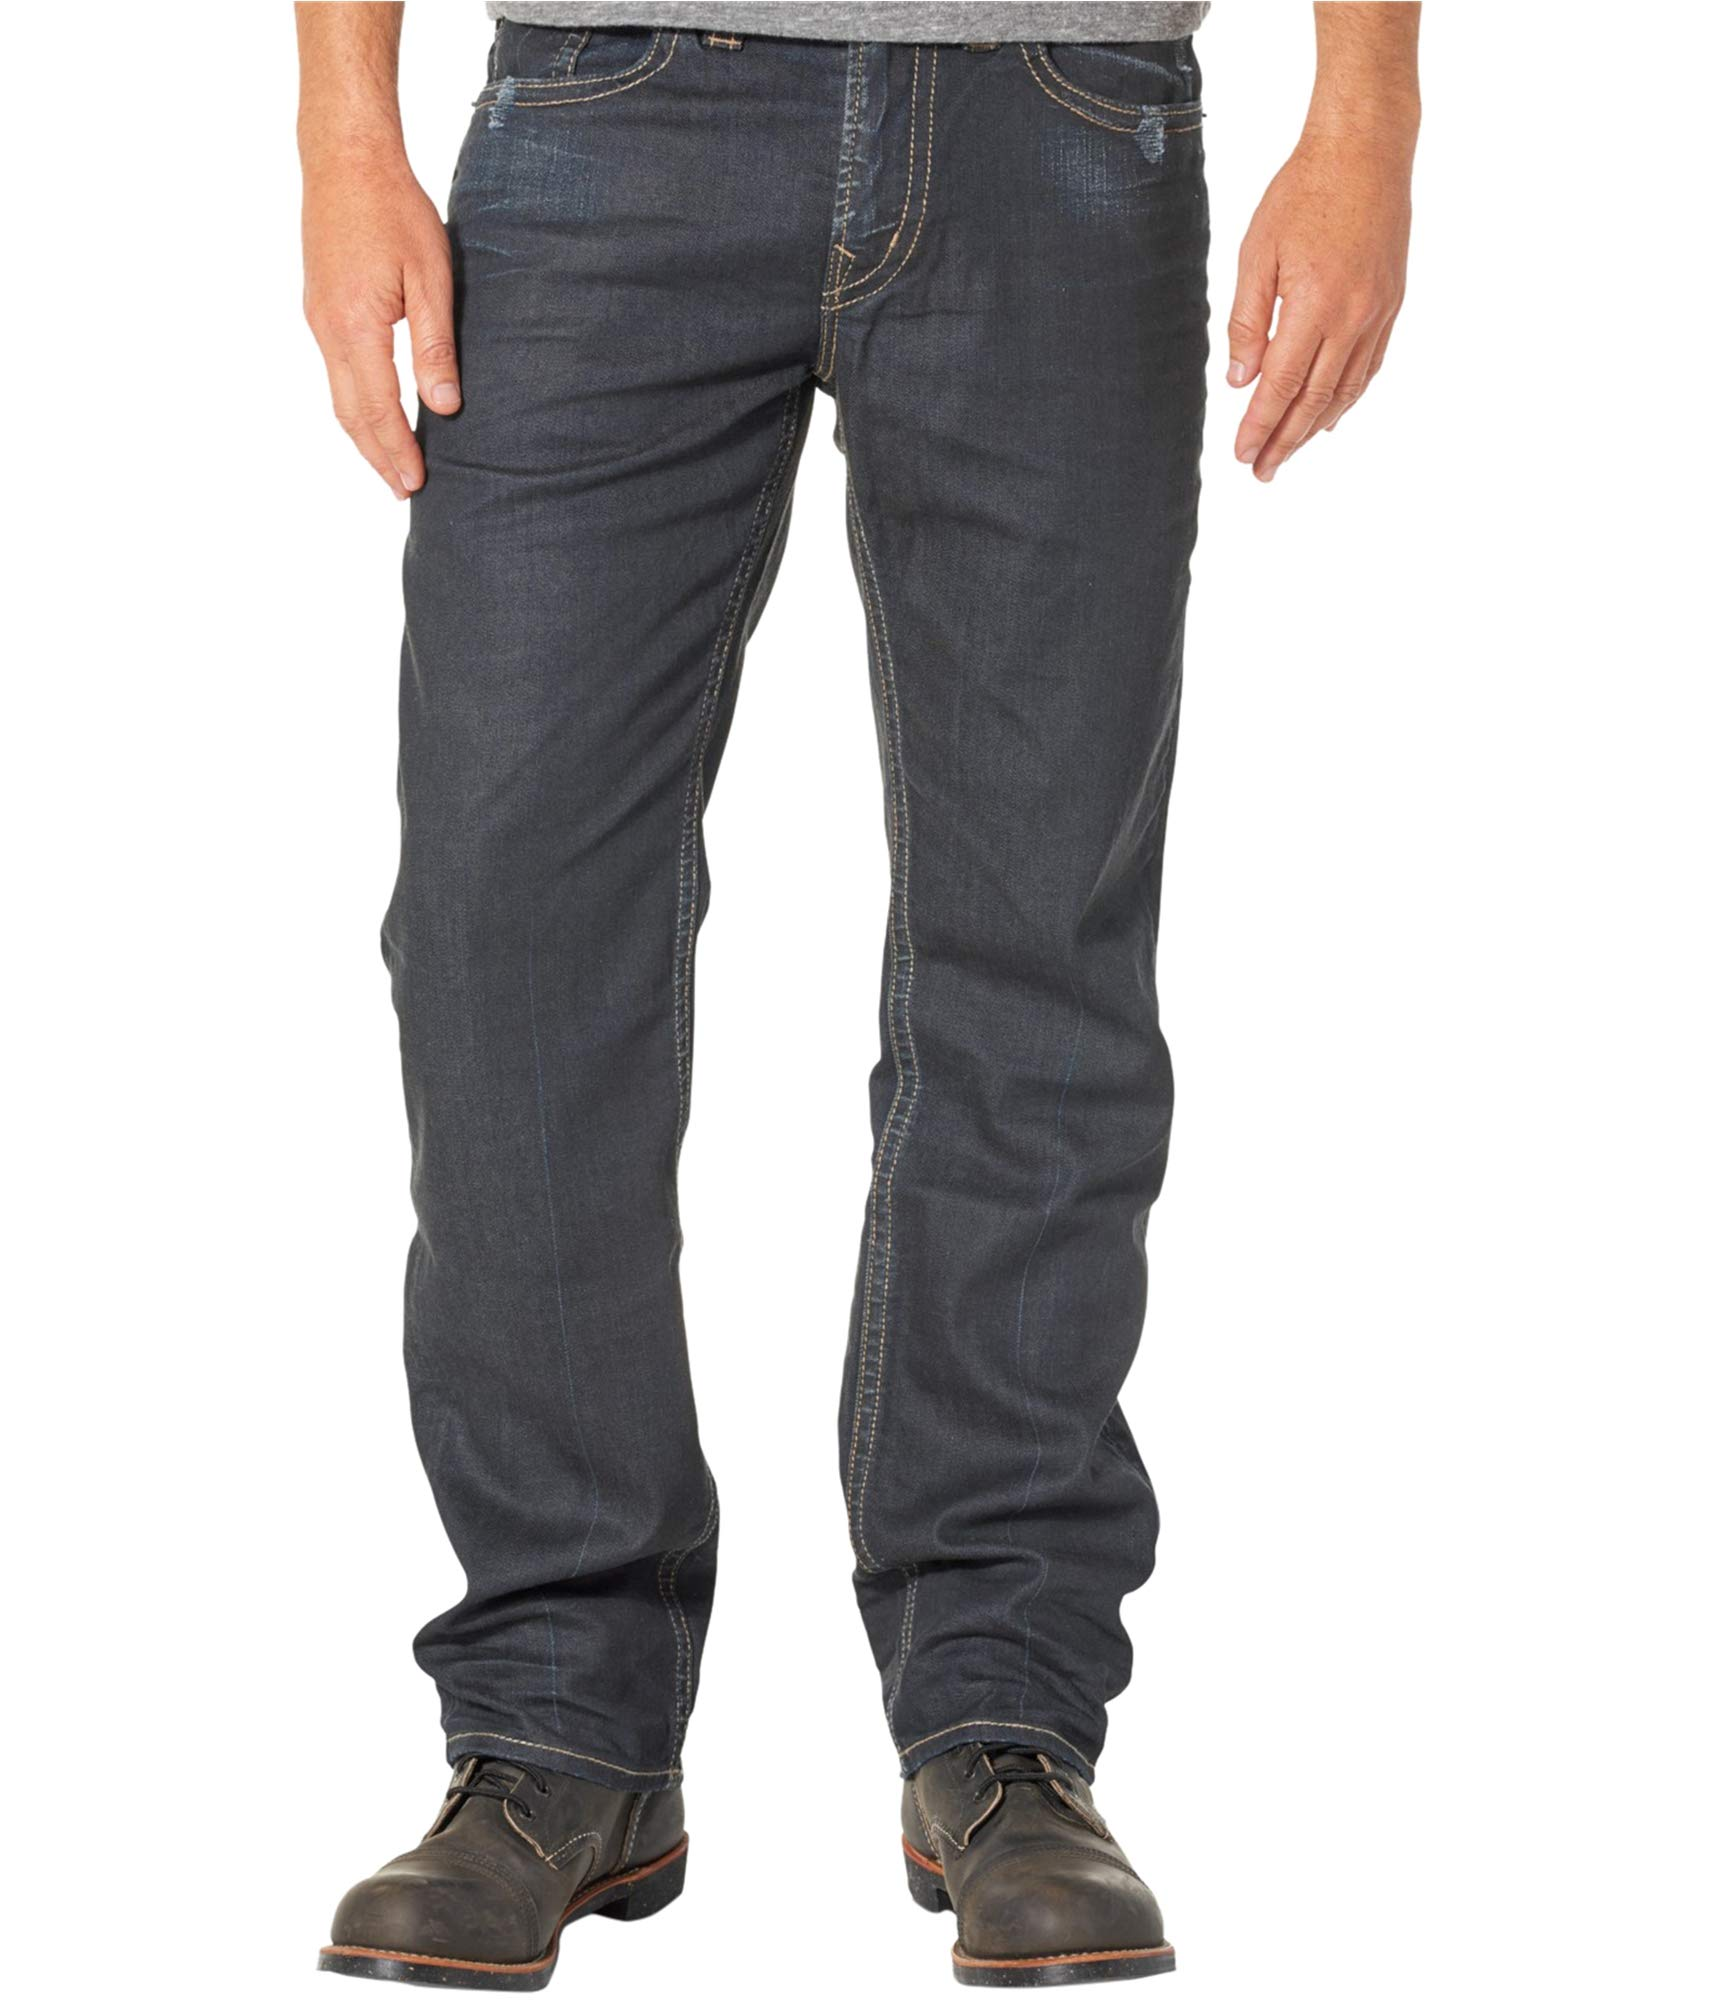 bc7ba47b66c Silver Jeans Co....... Men s Grayson Easy Fit Straight Leg Jeans ...